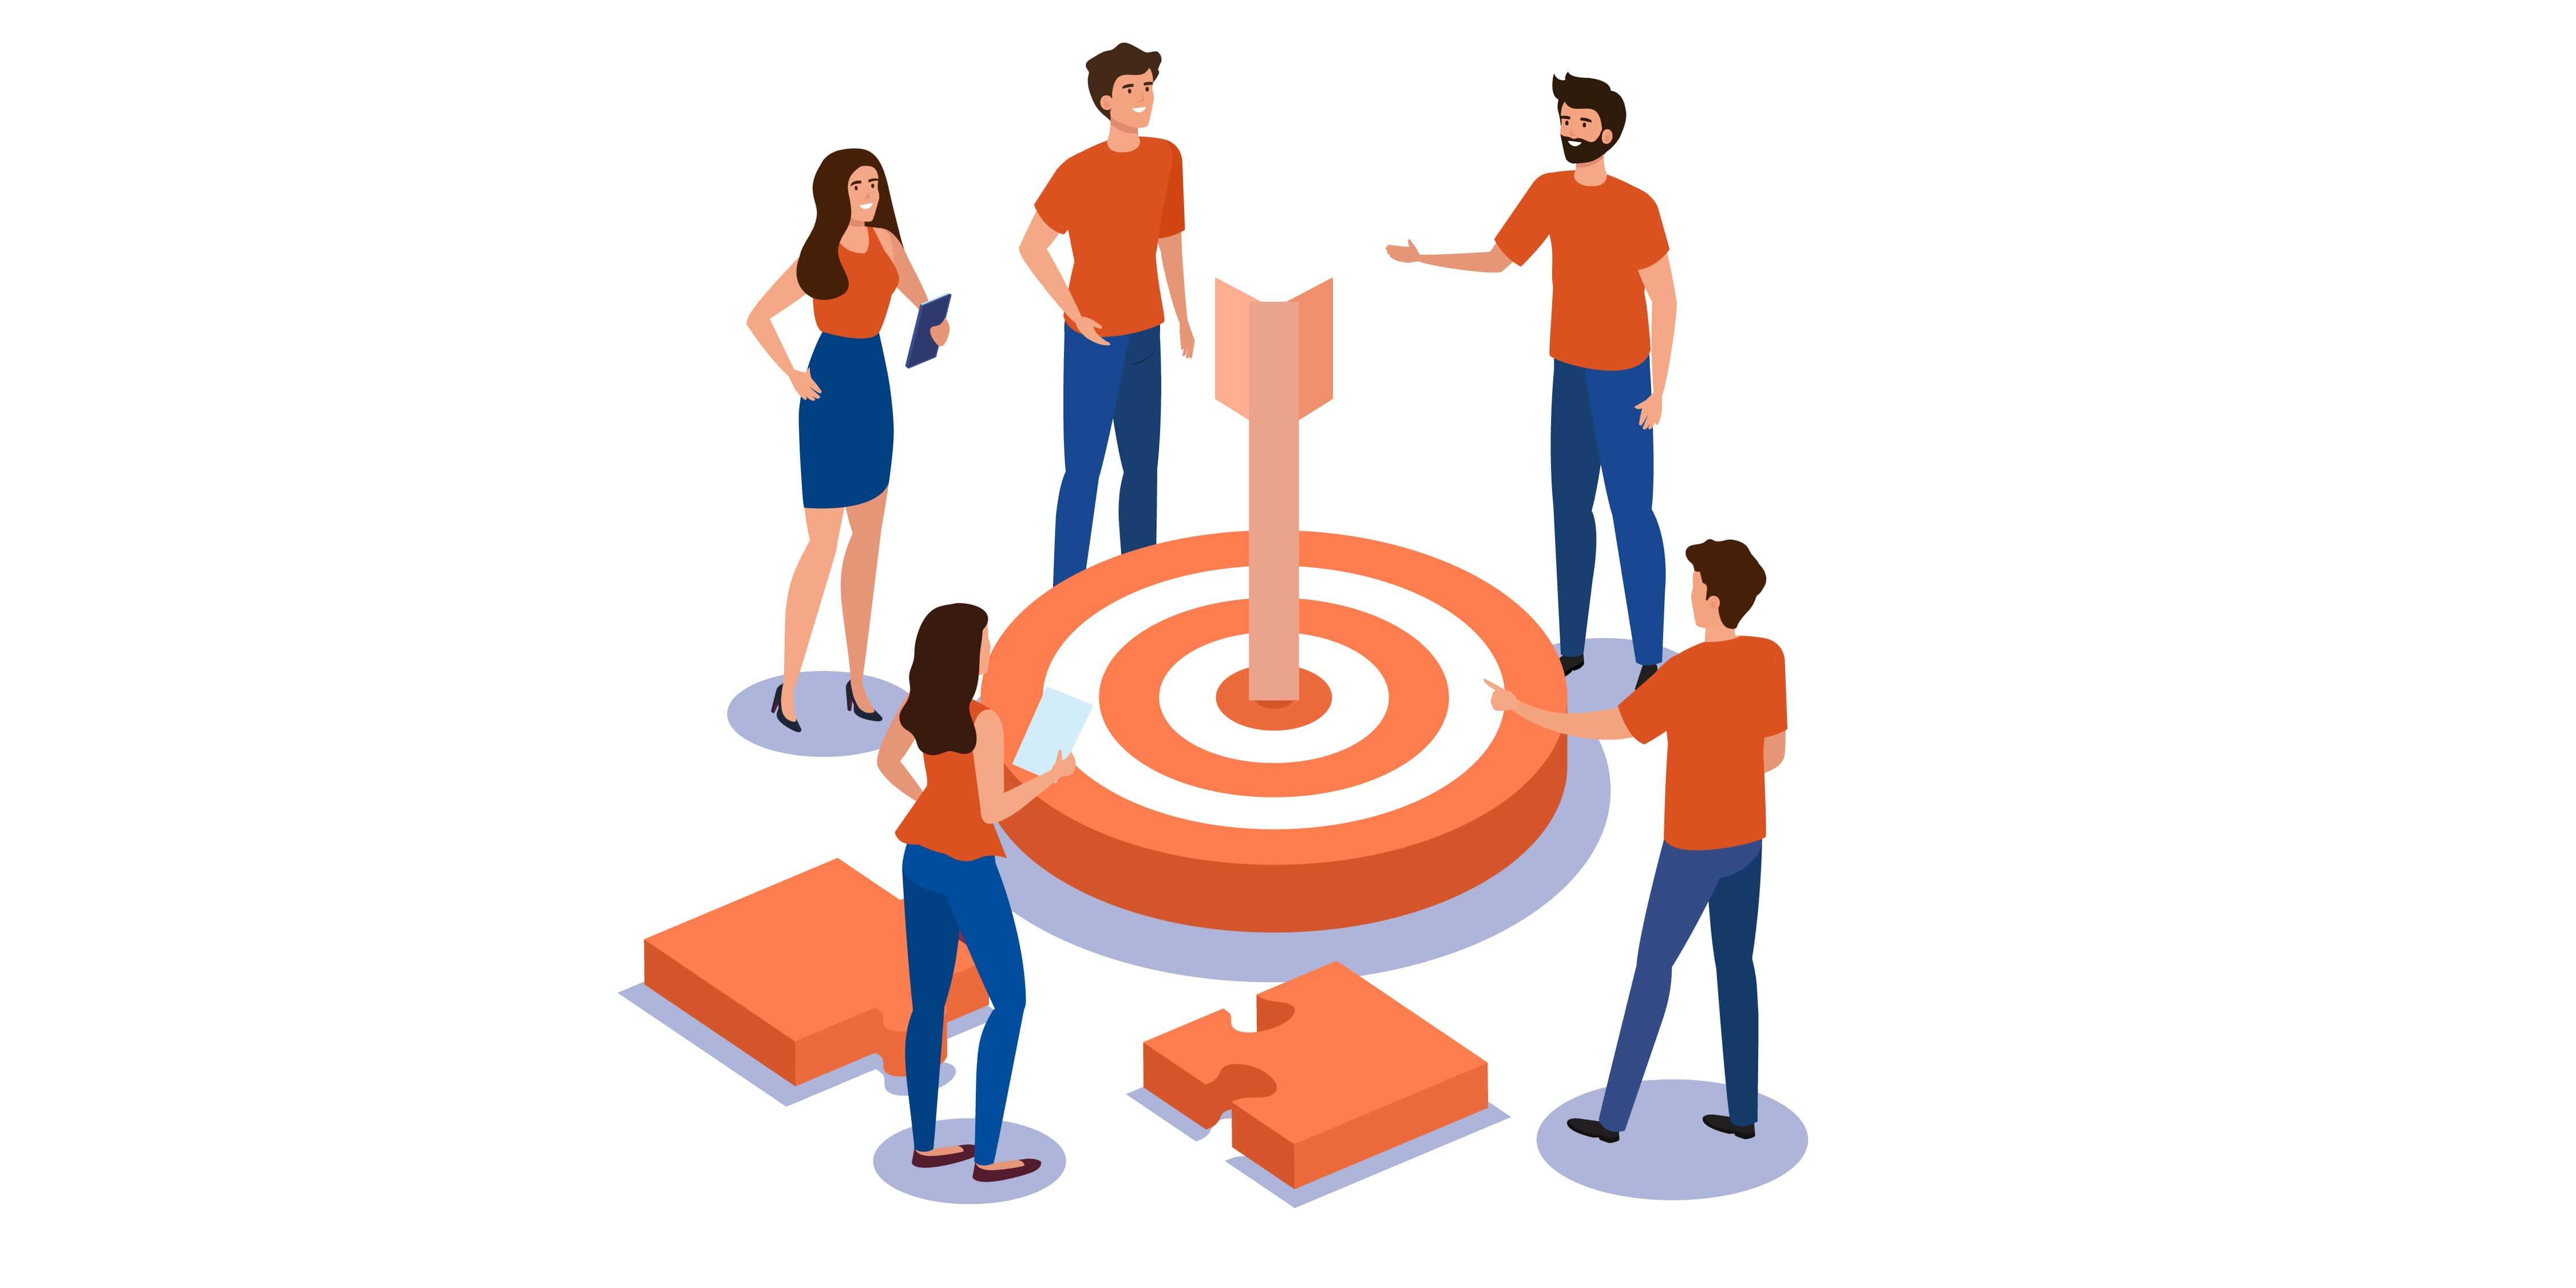 como definir mi cliente ideal cliente ideal marketing el cliente ideal perfil de mi cliente ideal